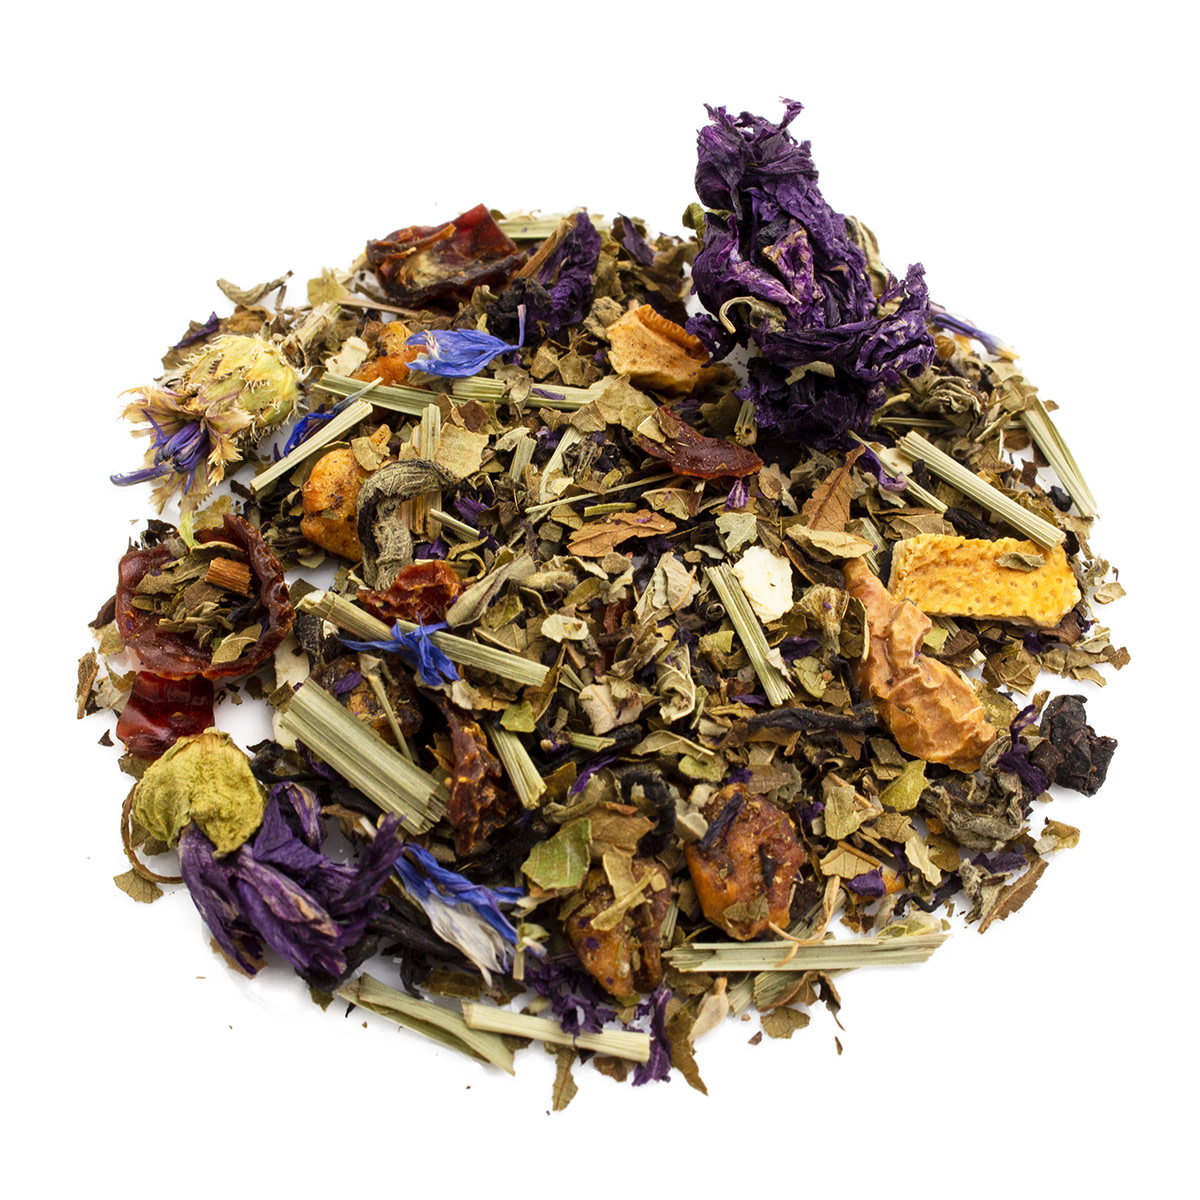 Teas Herbal Tea - Blueberry Blossom